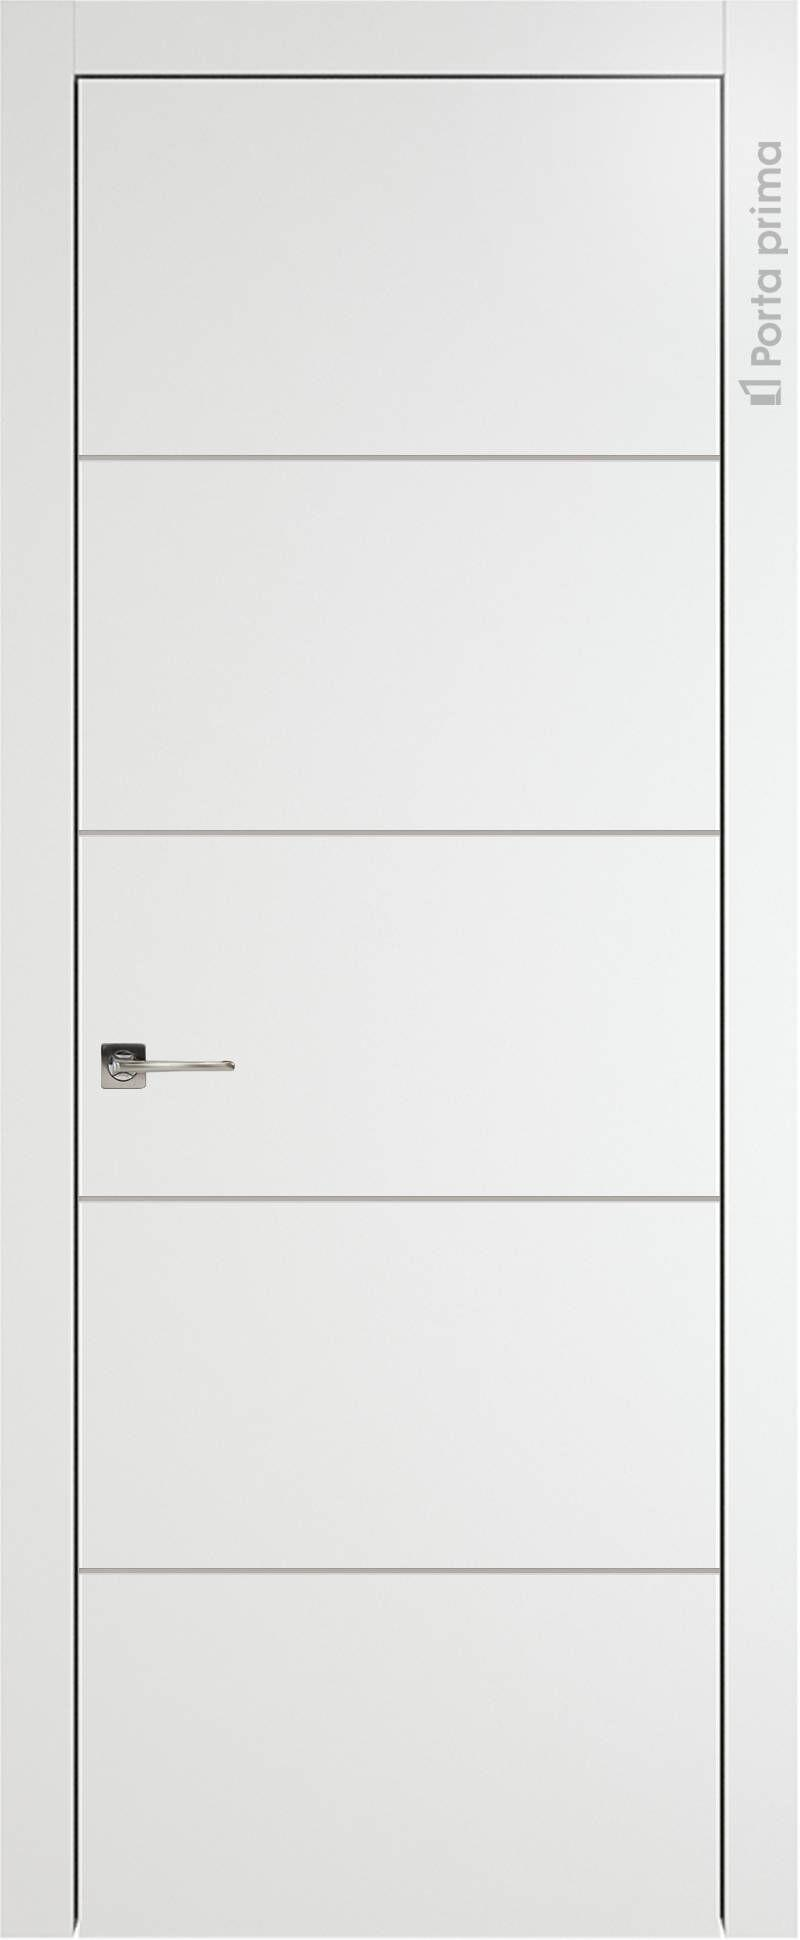 Tivoli Д-2 цвет - Белая эмаль (RAL 9003) Без стекла (ДГ)